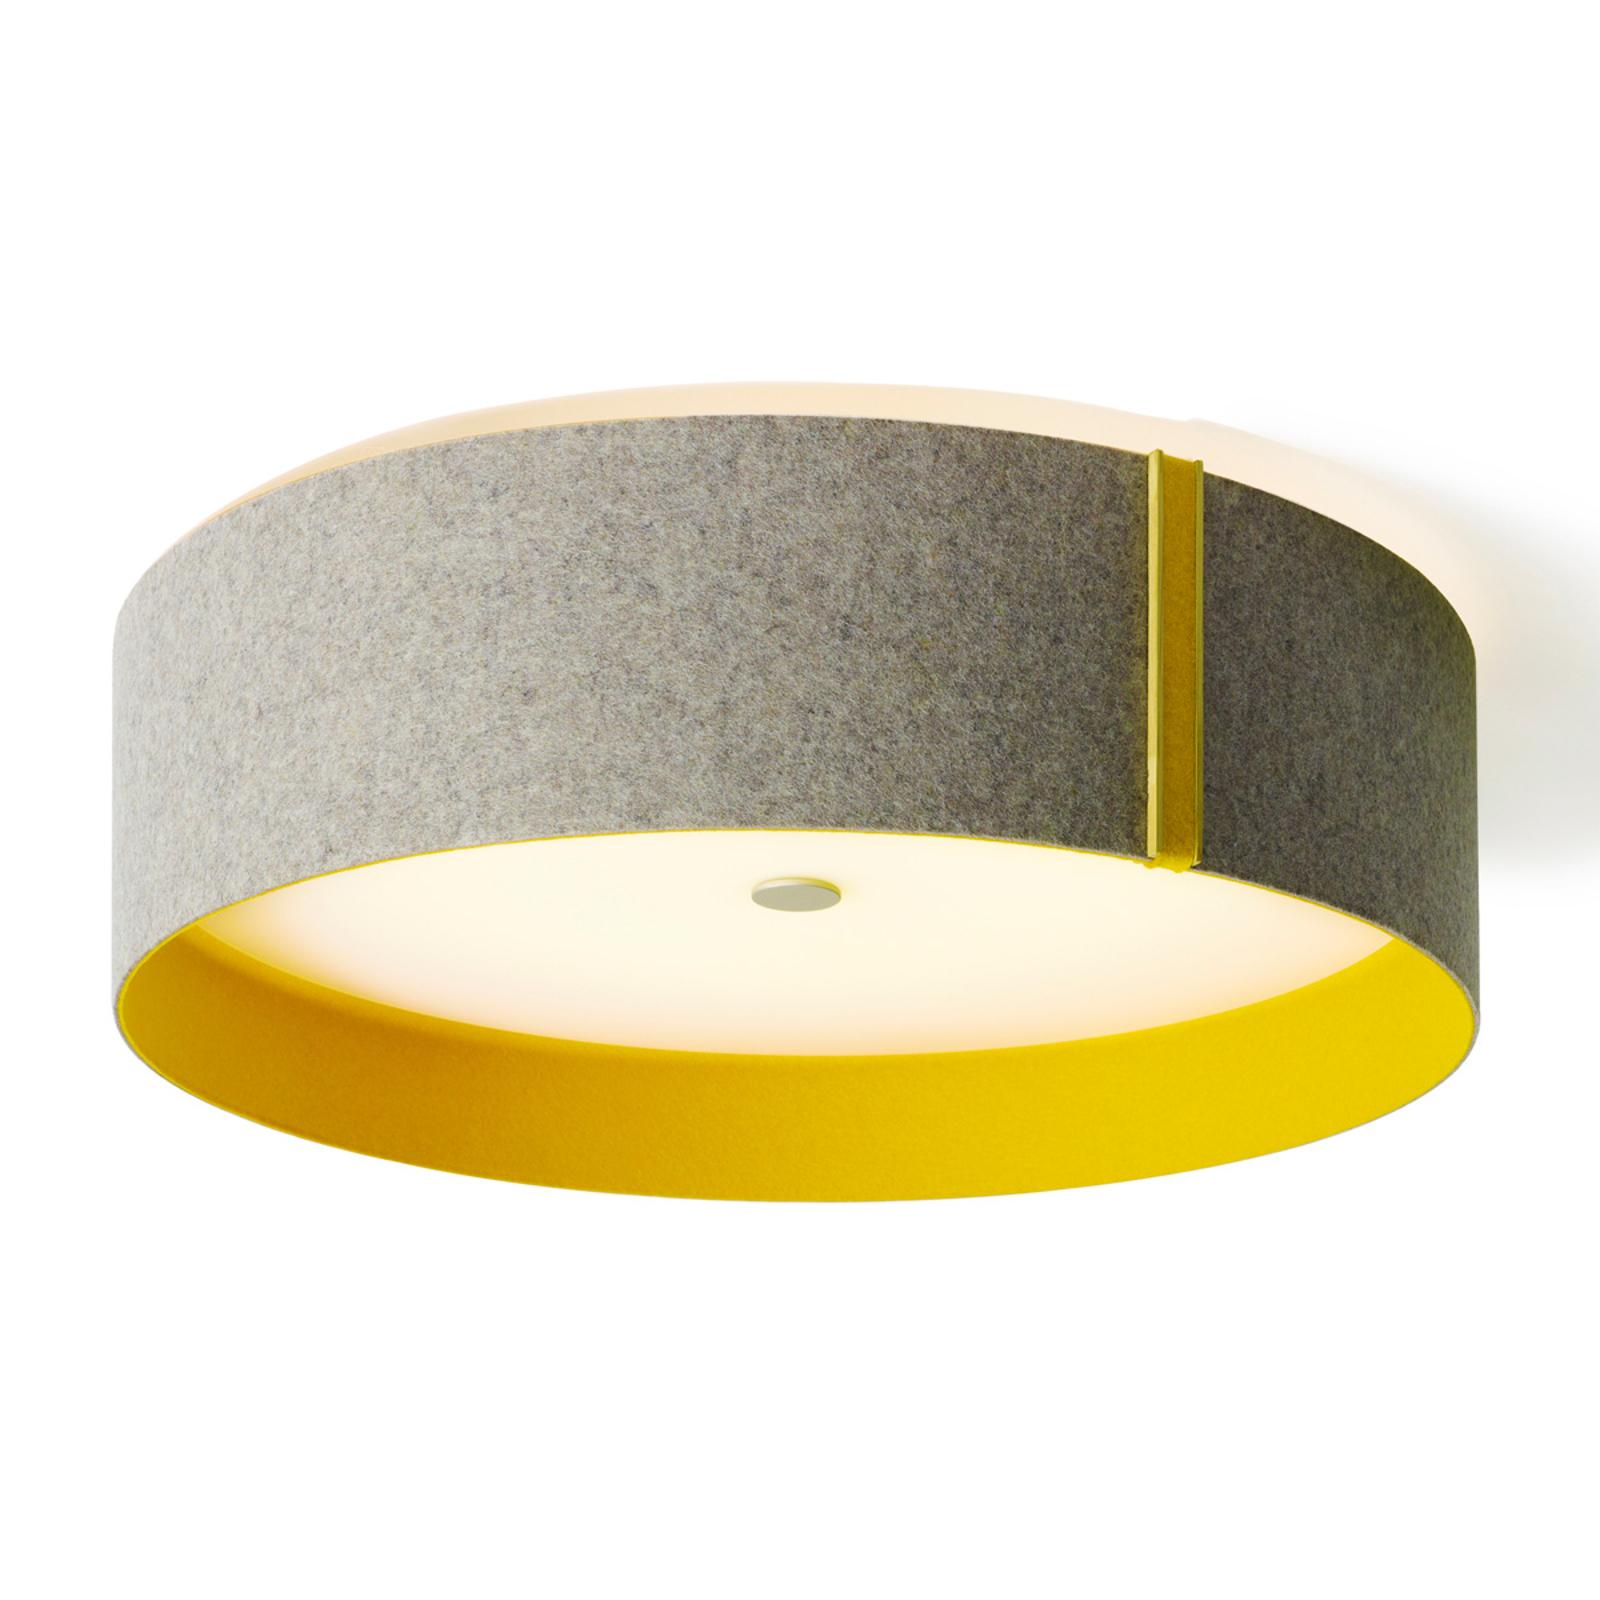 Taklampe Lara felt av filt, LED, grå-curry